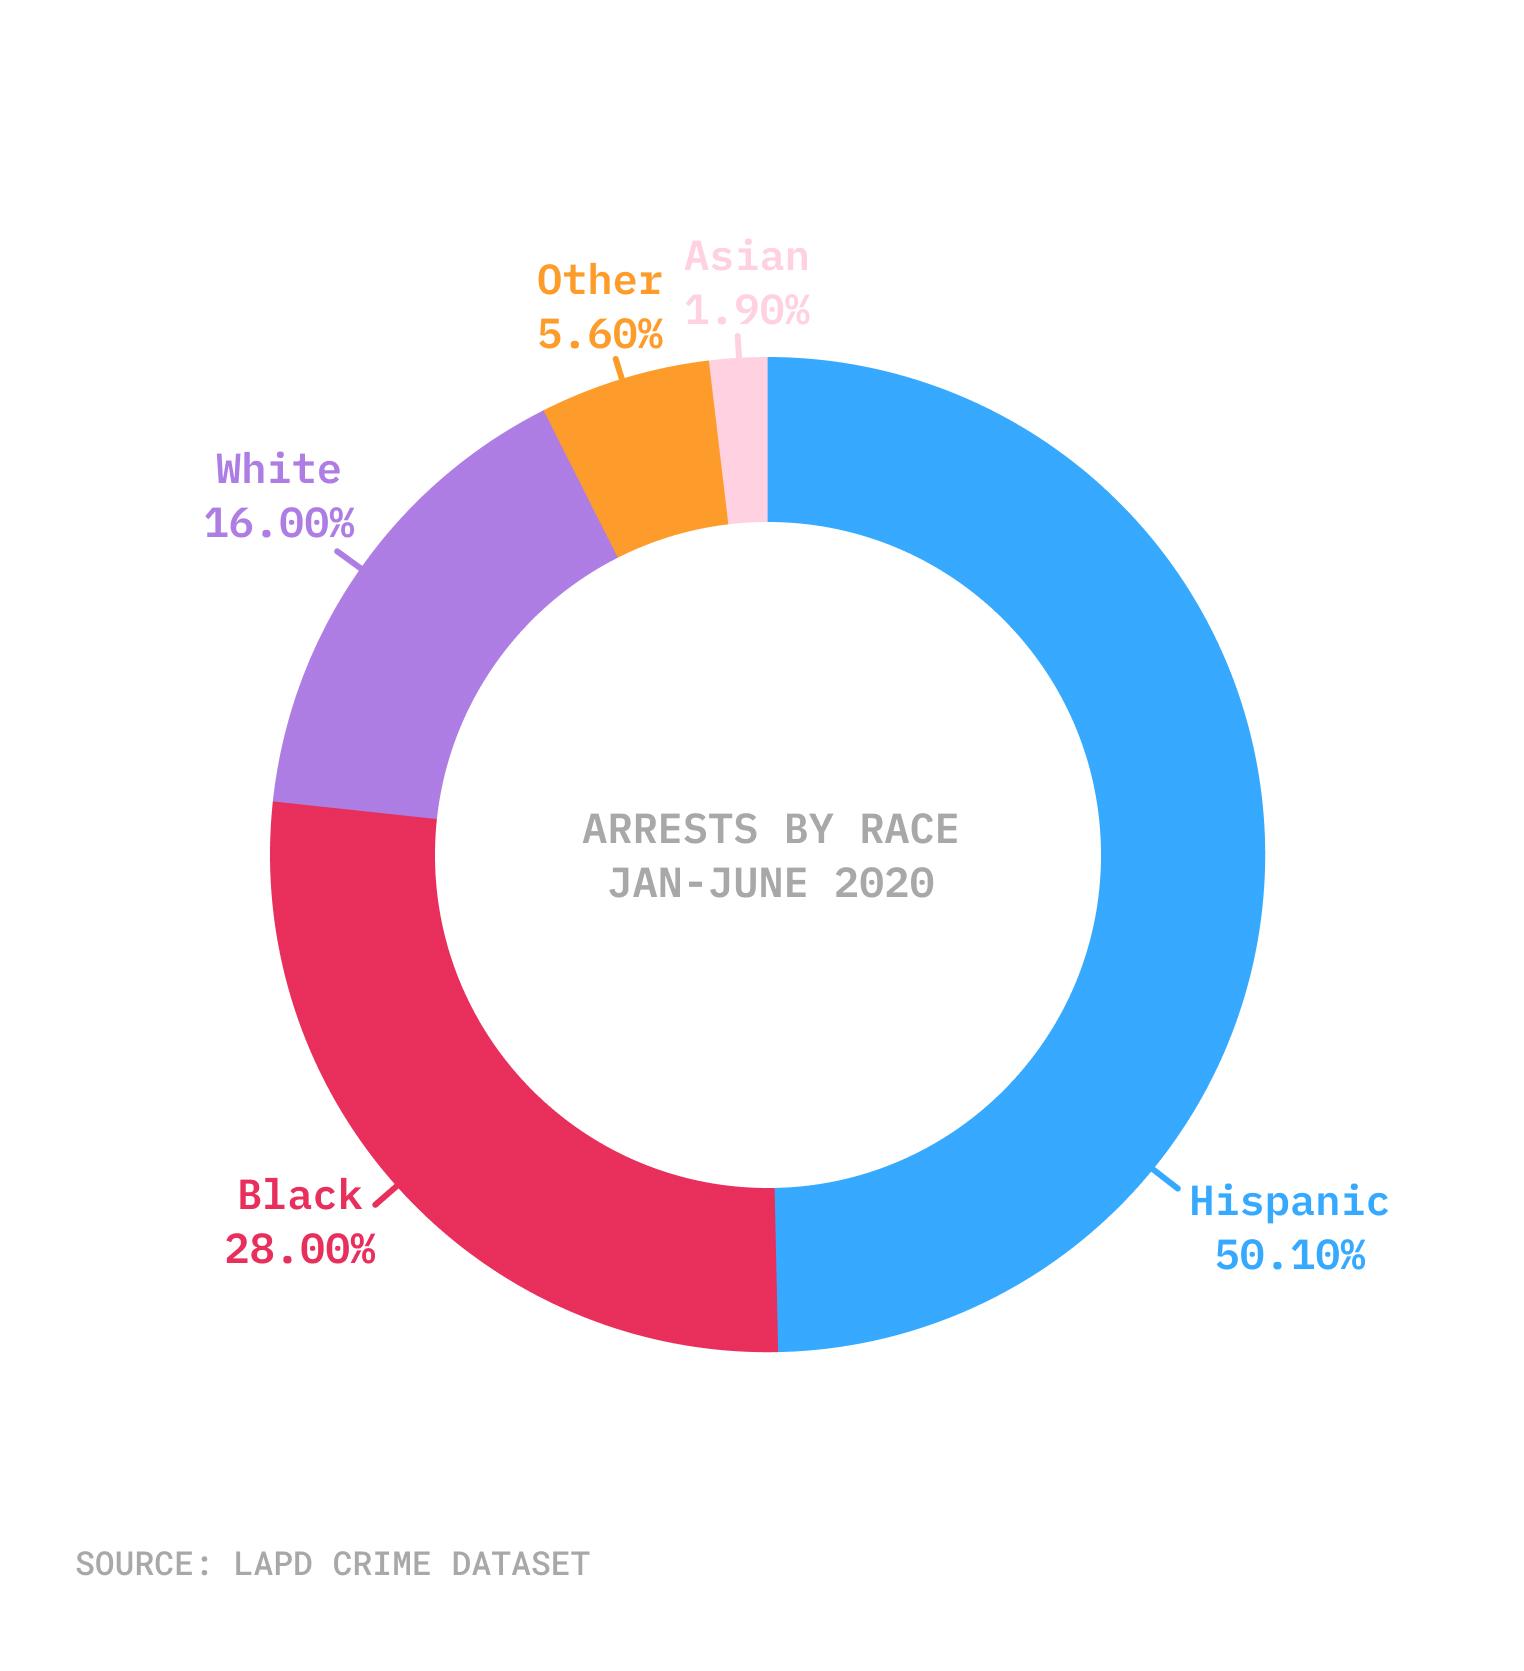 Racial breakdown of arrests in LA